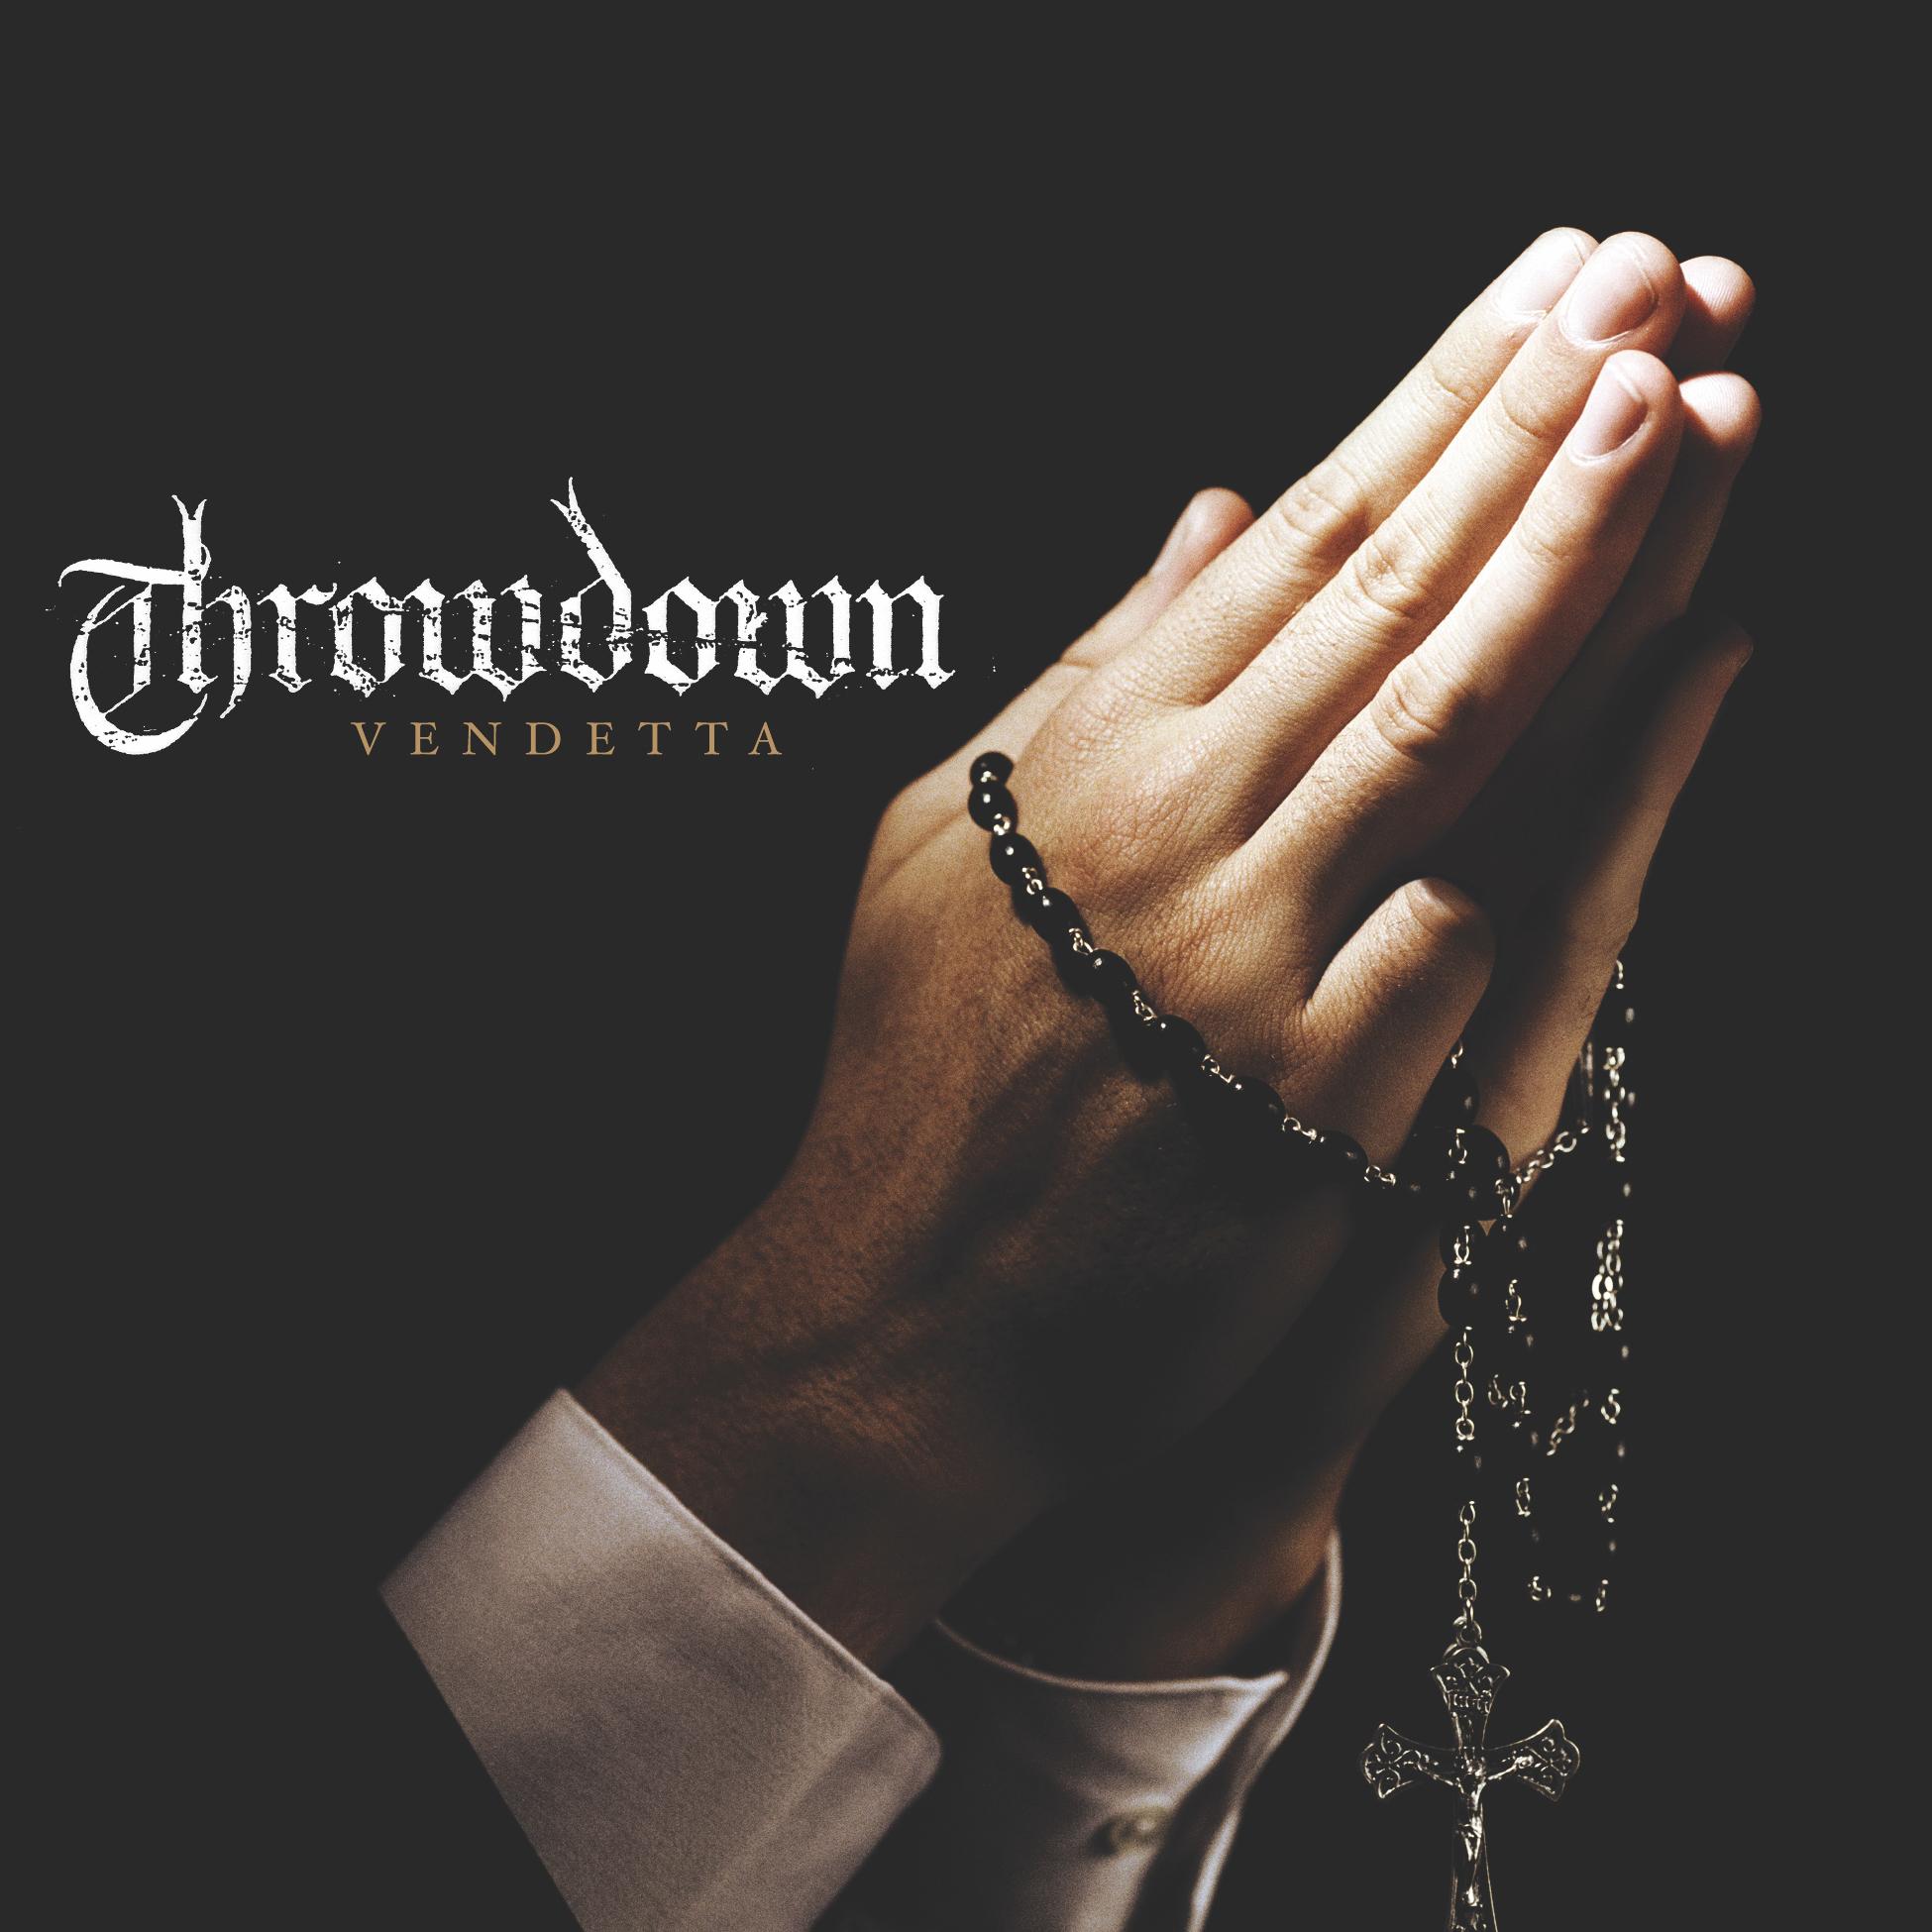 Throwdown_vendetta.jpg